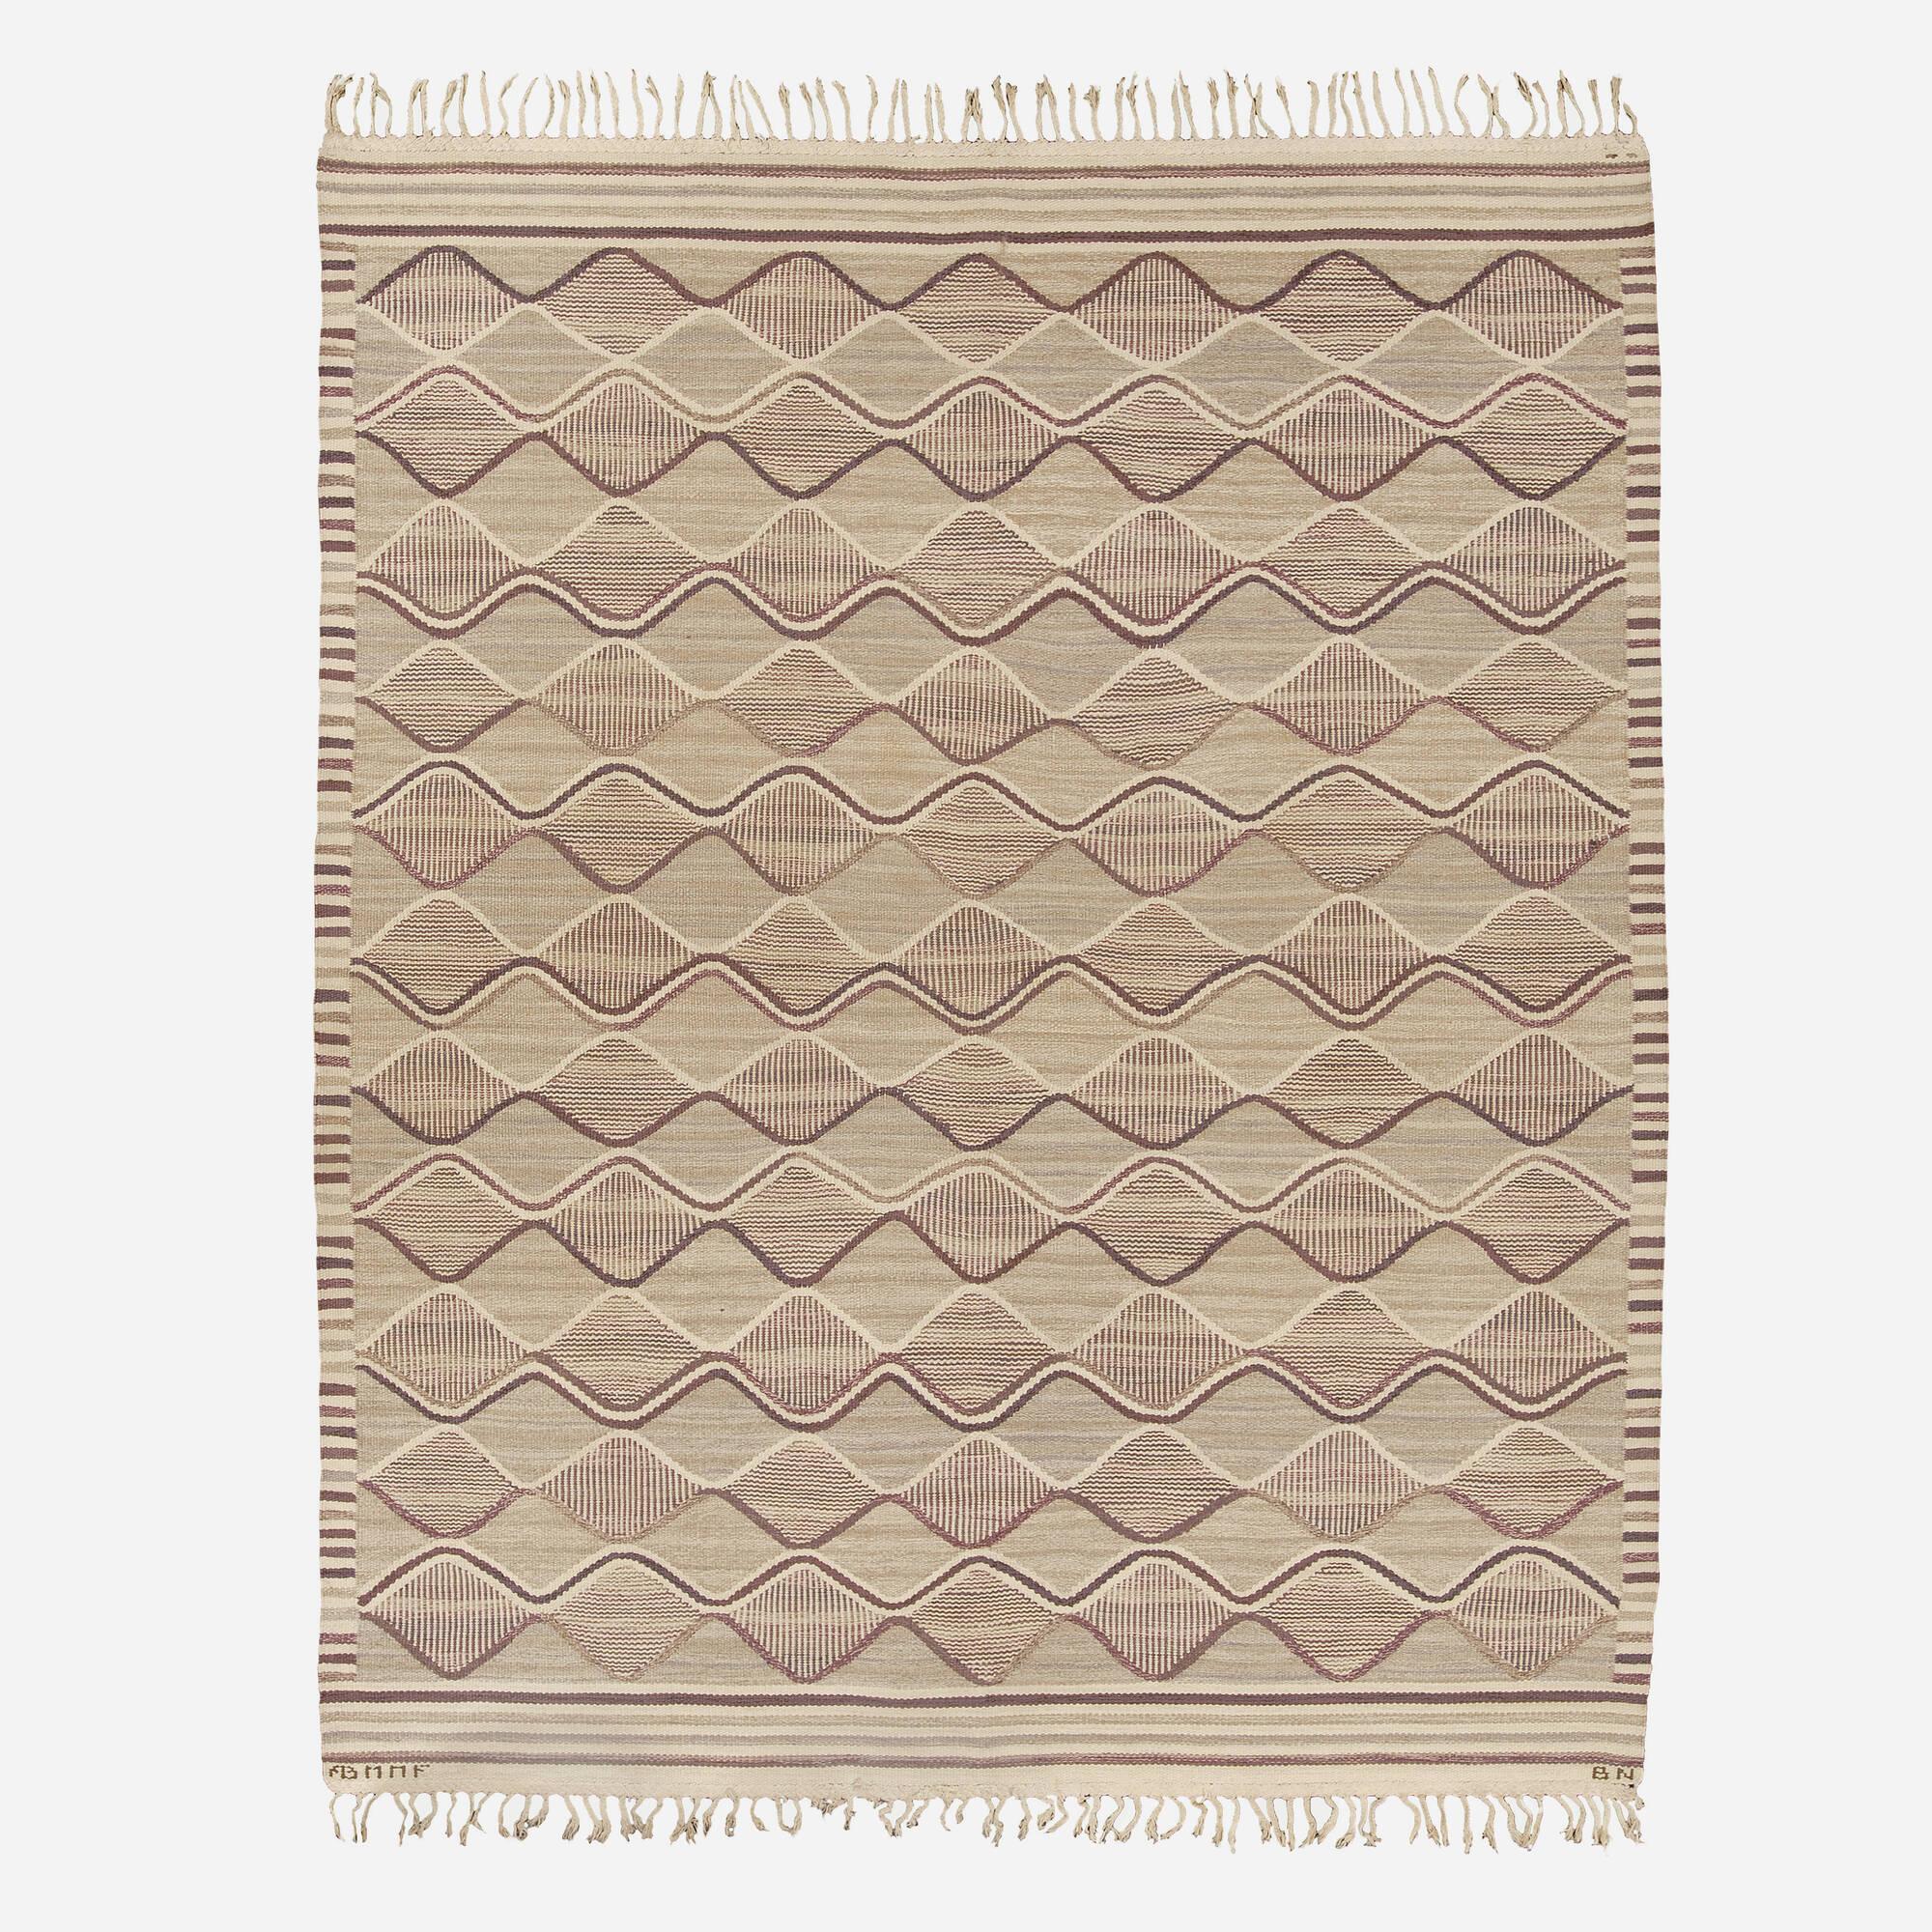 181: Barbro Nilsson / Spättan tapestry weave carpet (1 of 1)